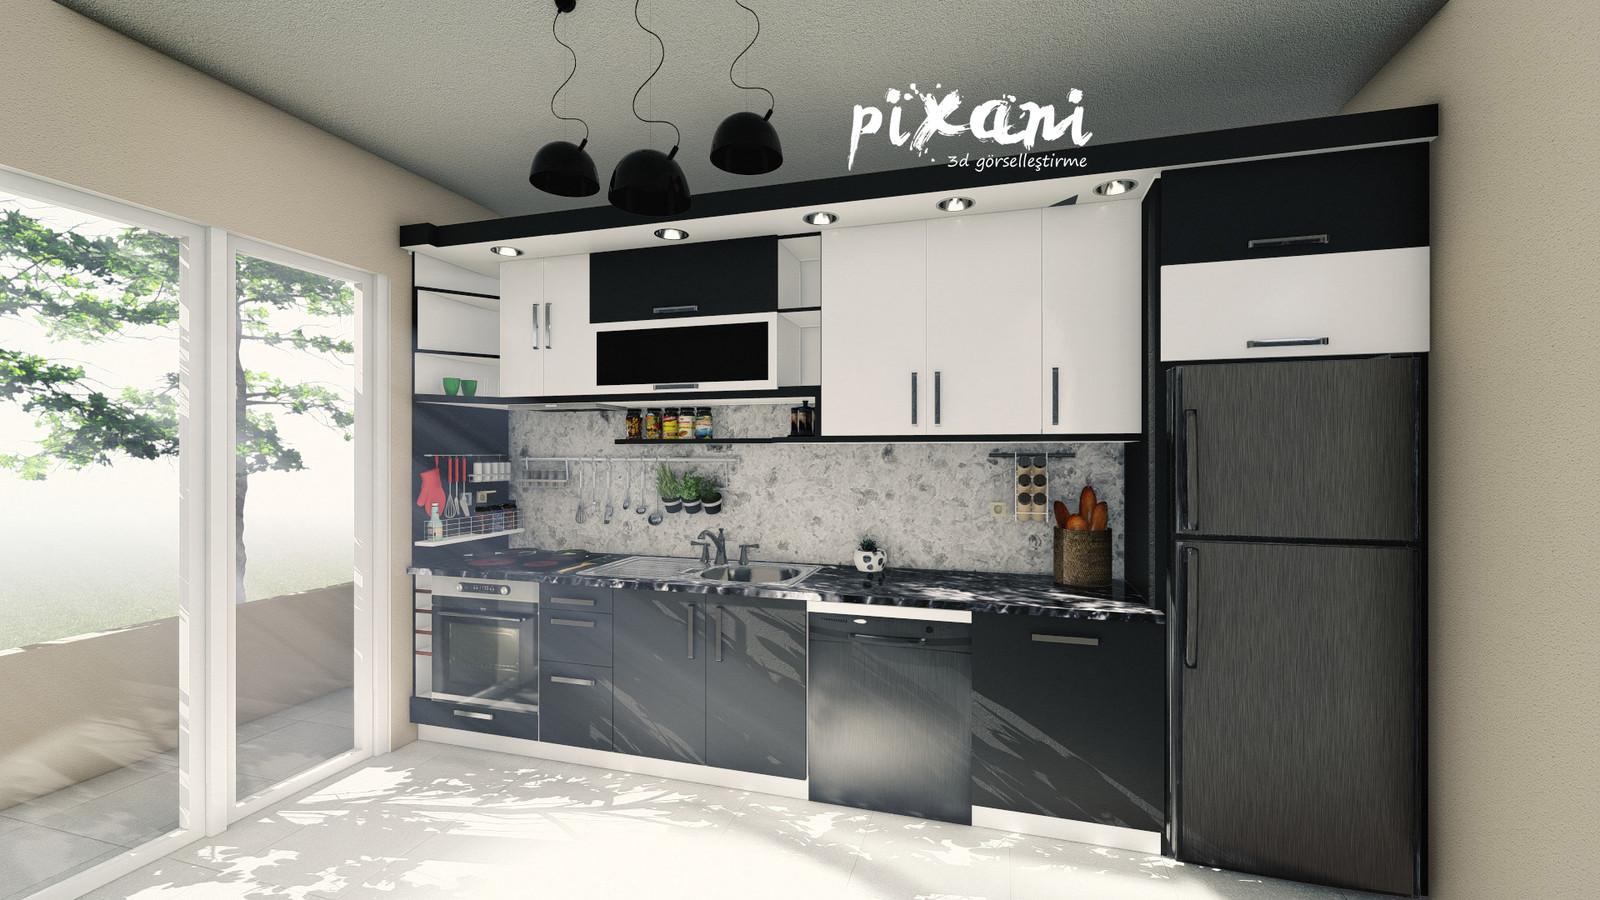 KITCHEN DESIGN 3 Architect & CG Artist : Serdar Çakmak rendered and designed in Pixani Studios www.pix-ani.com